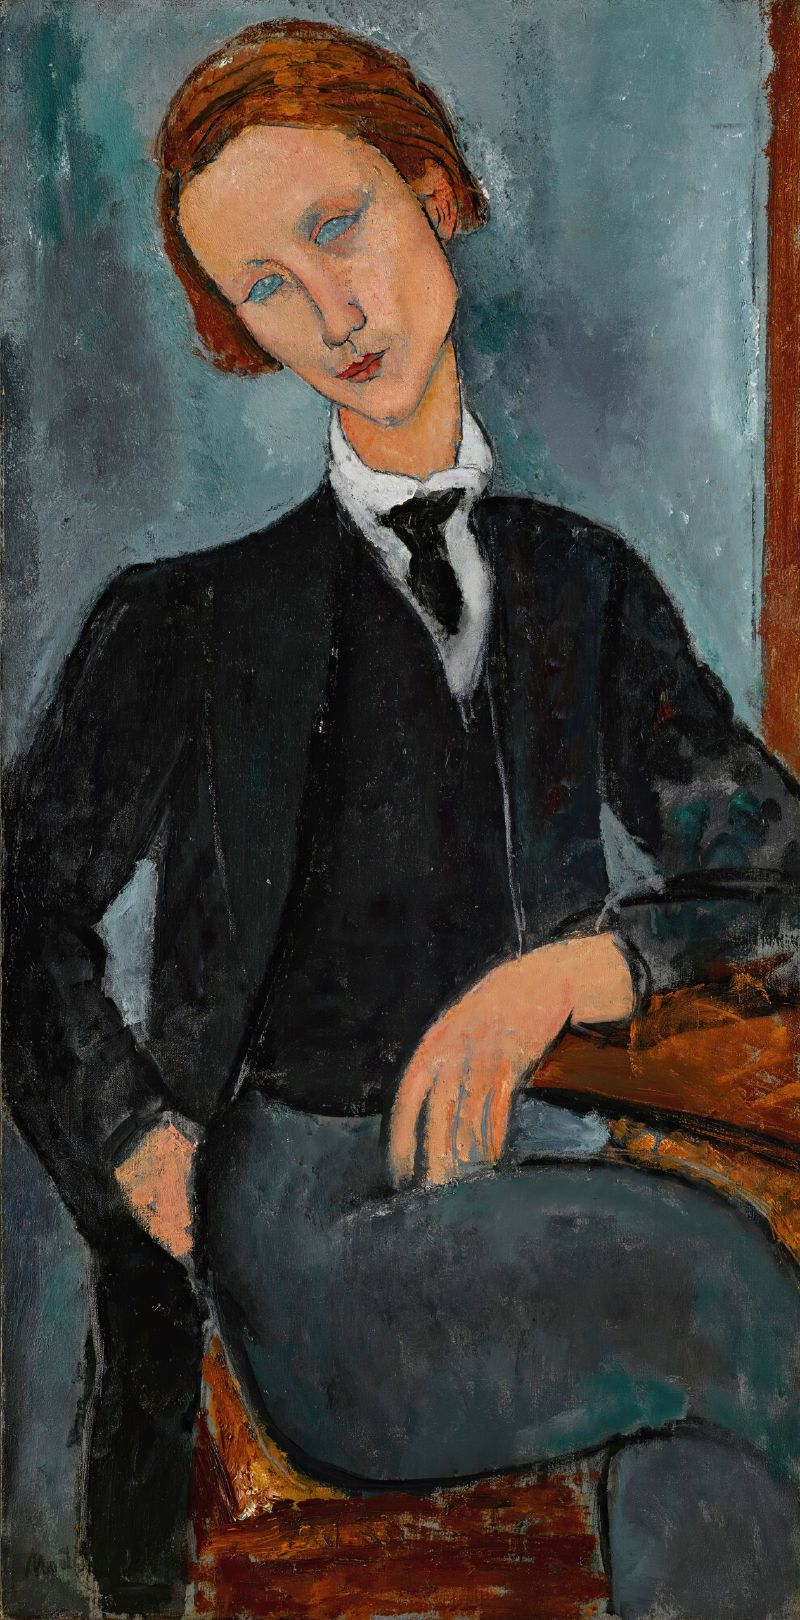 Portrait de Baranowski